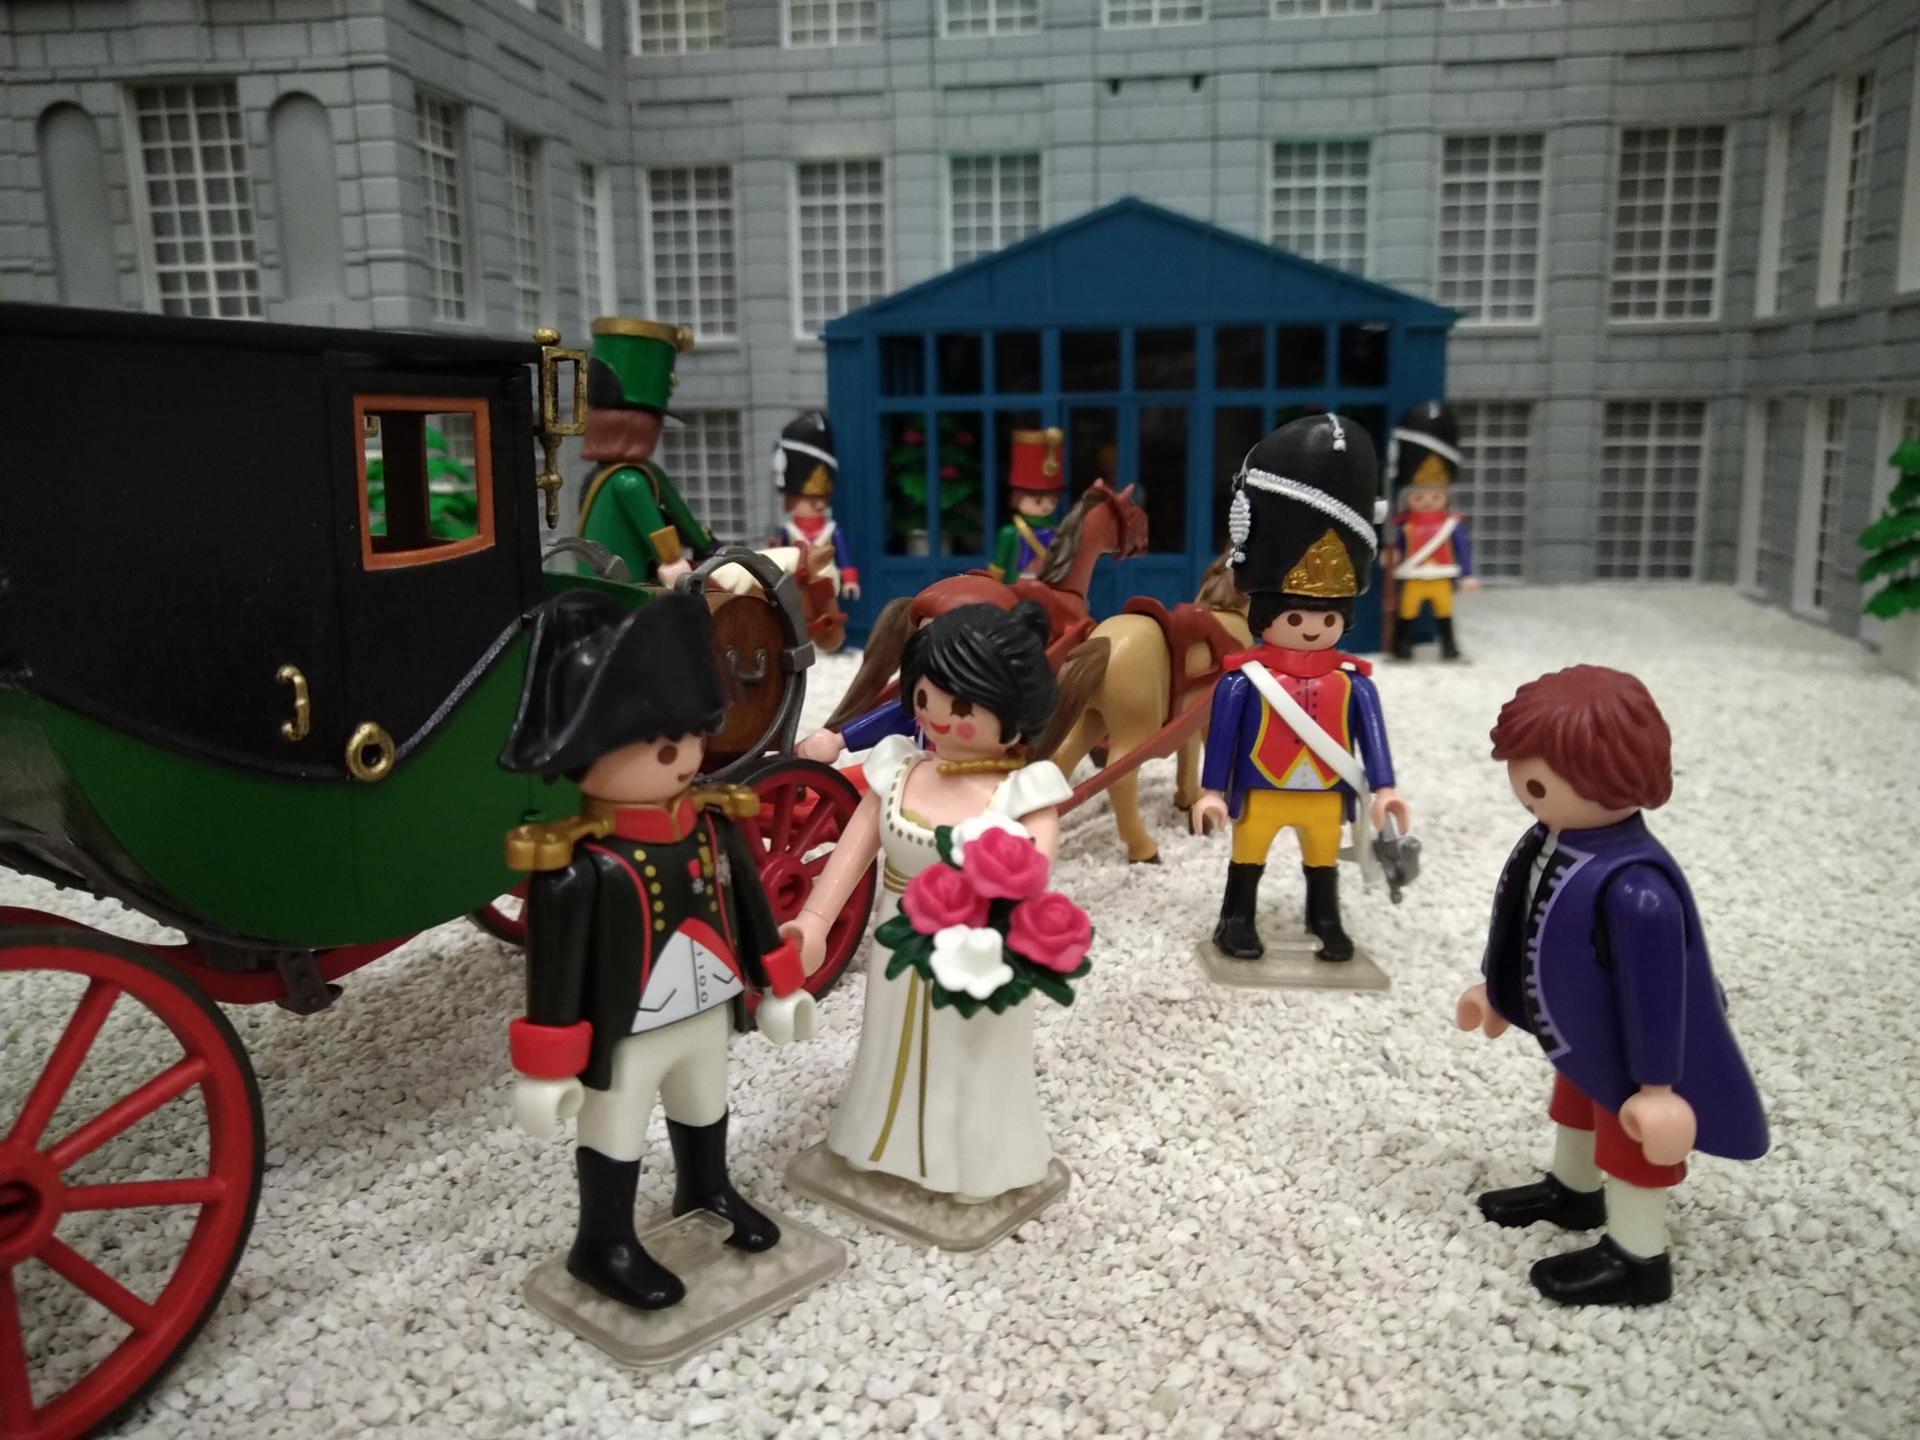 La malmaison et napoleon en playmobil